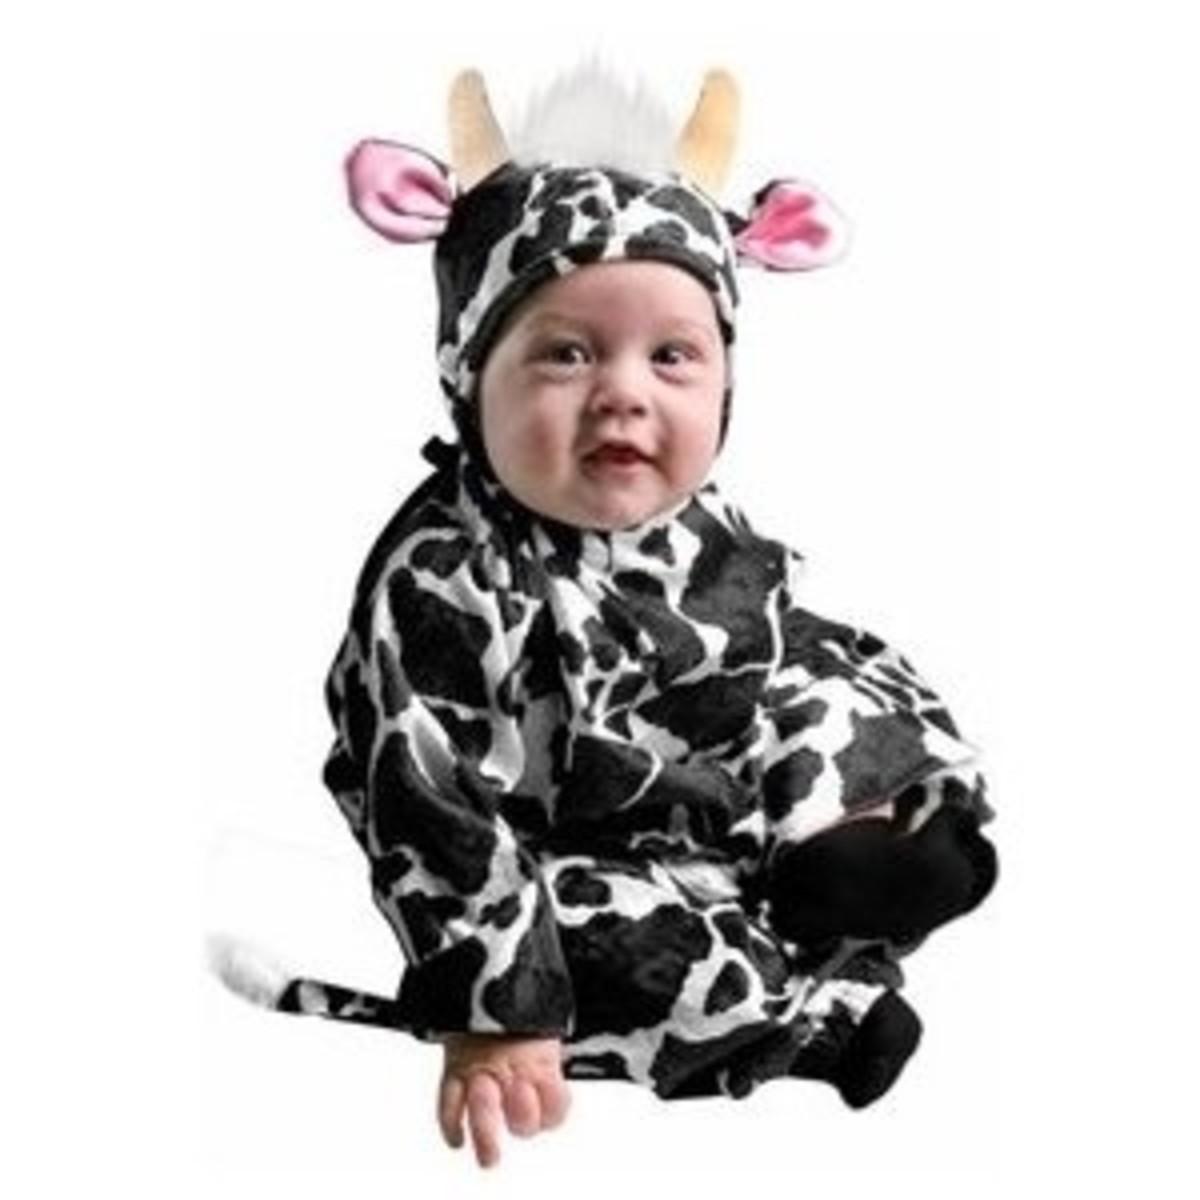 Infant Farm Animal Baby Cow Halloween Costume (6-18 Months)